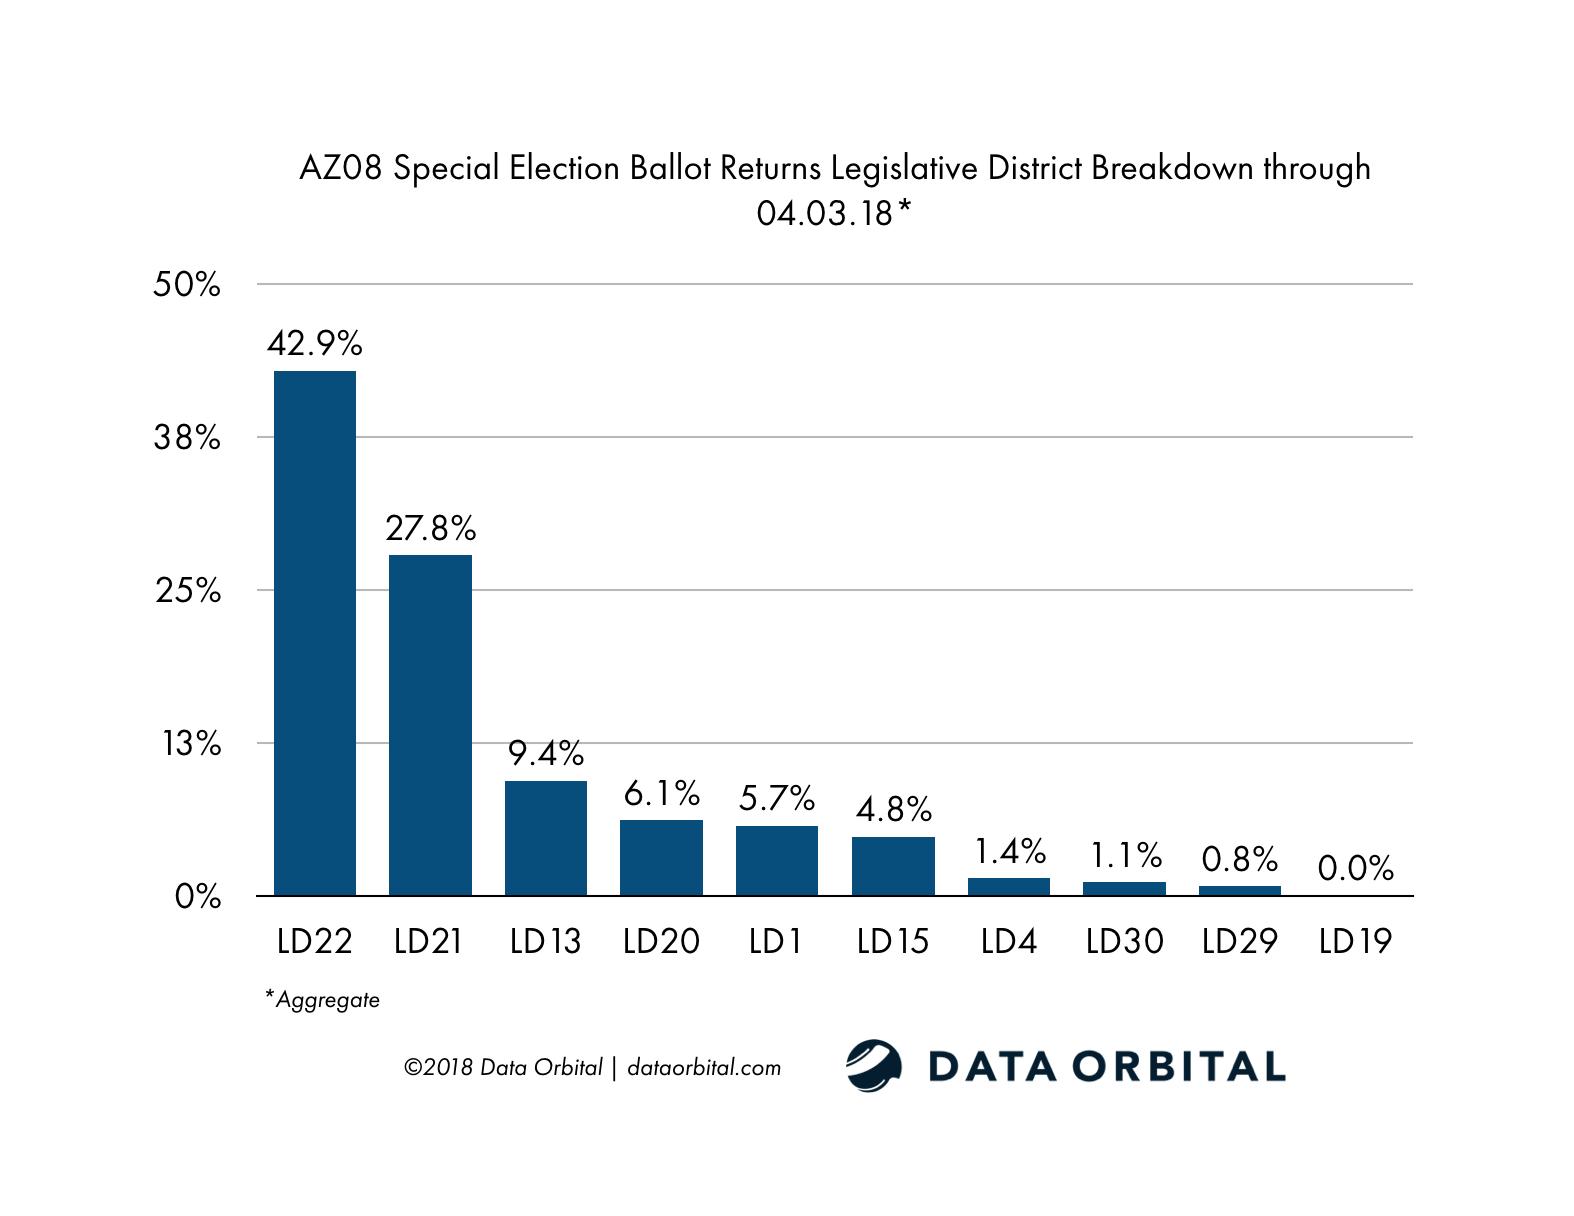 AZ08 Special Election Ballot Returns LD Breakdown 04_03_18